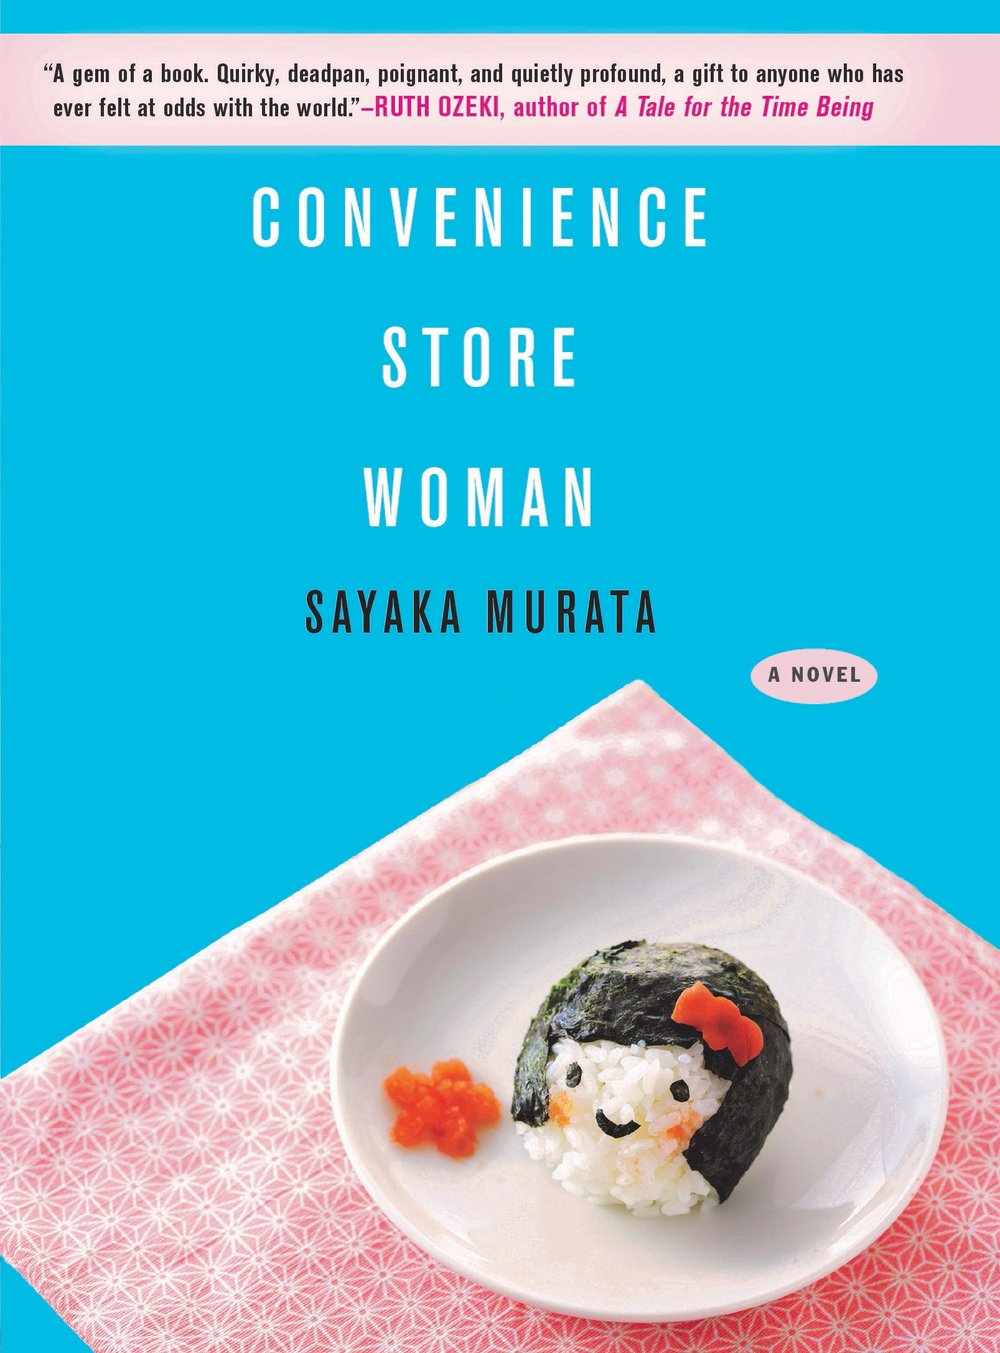 Convenience Store Woman - AUTHOR: Sayaka Murata (村田沙耶香)TRANSLATOR: Ginny Tapley TakemoriASIN: B075VC651YPUBLISHER: Grove PressRELEASE DATE: Jun 12th, 2018PAGES: 176 pagesEDITION LANGUAGE: EnglishORIGINAL LANGUAGE: JapaneseSETTING: Japan